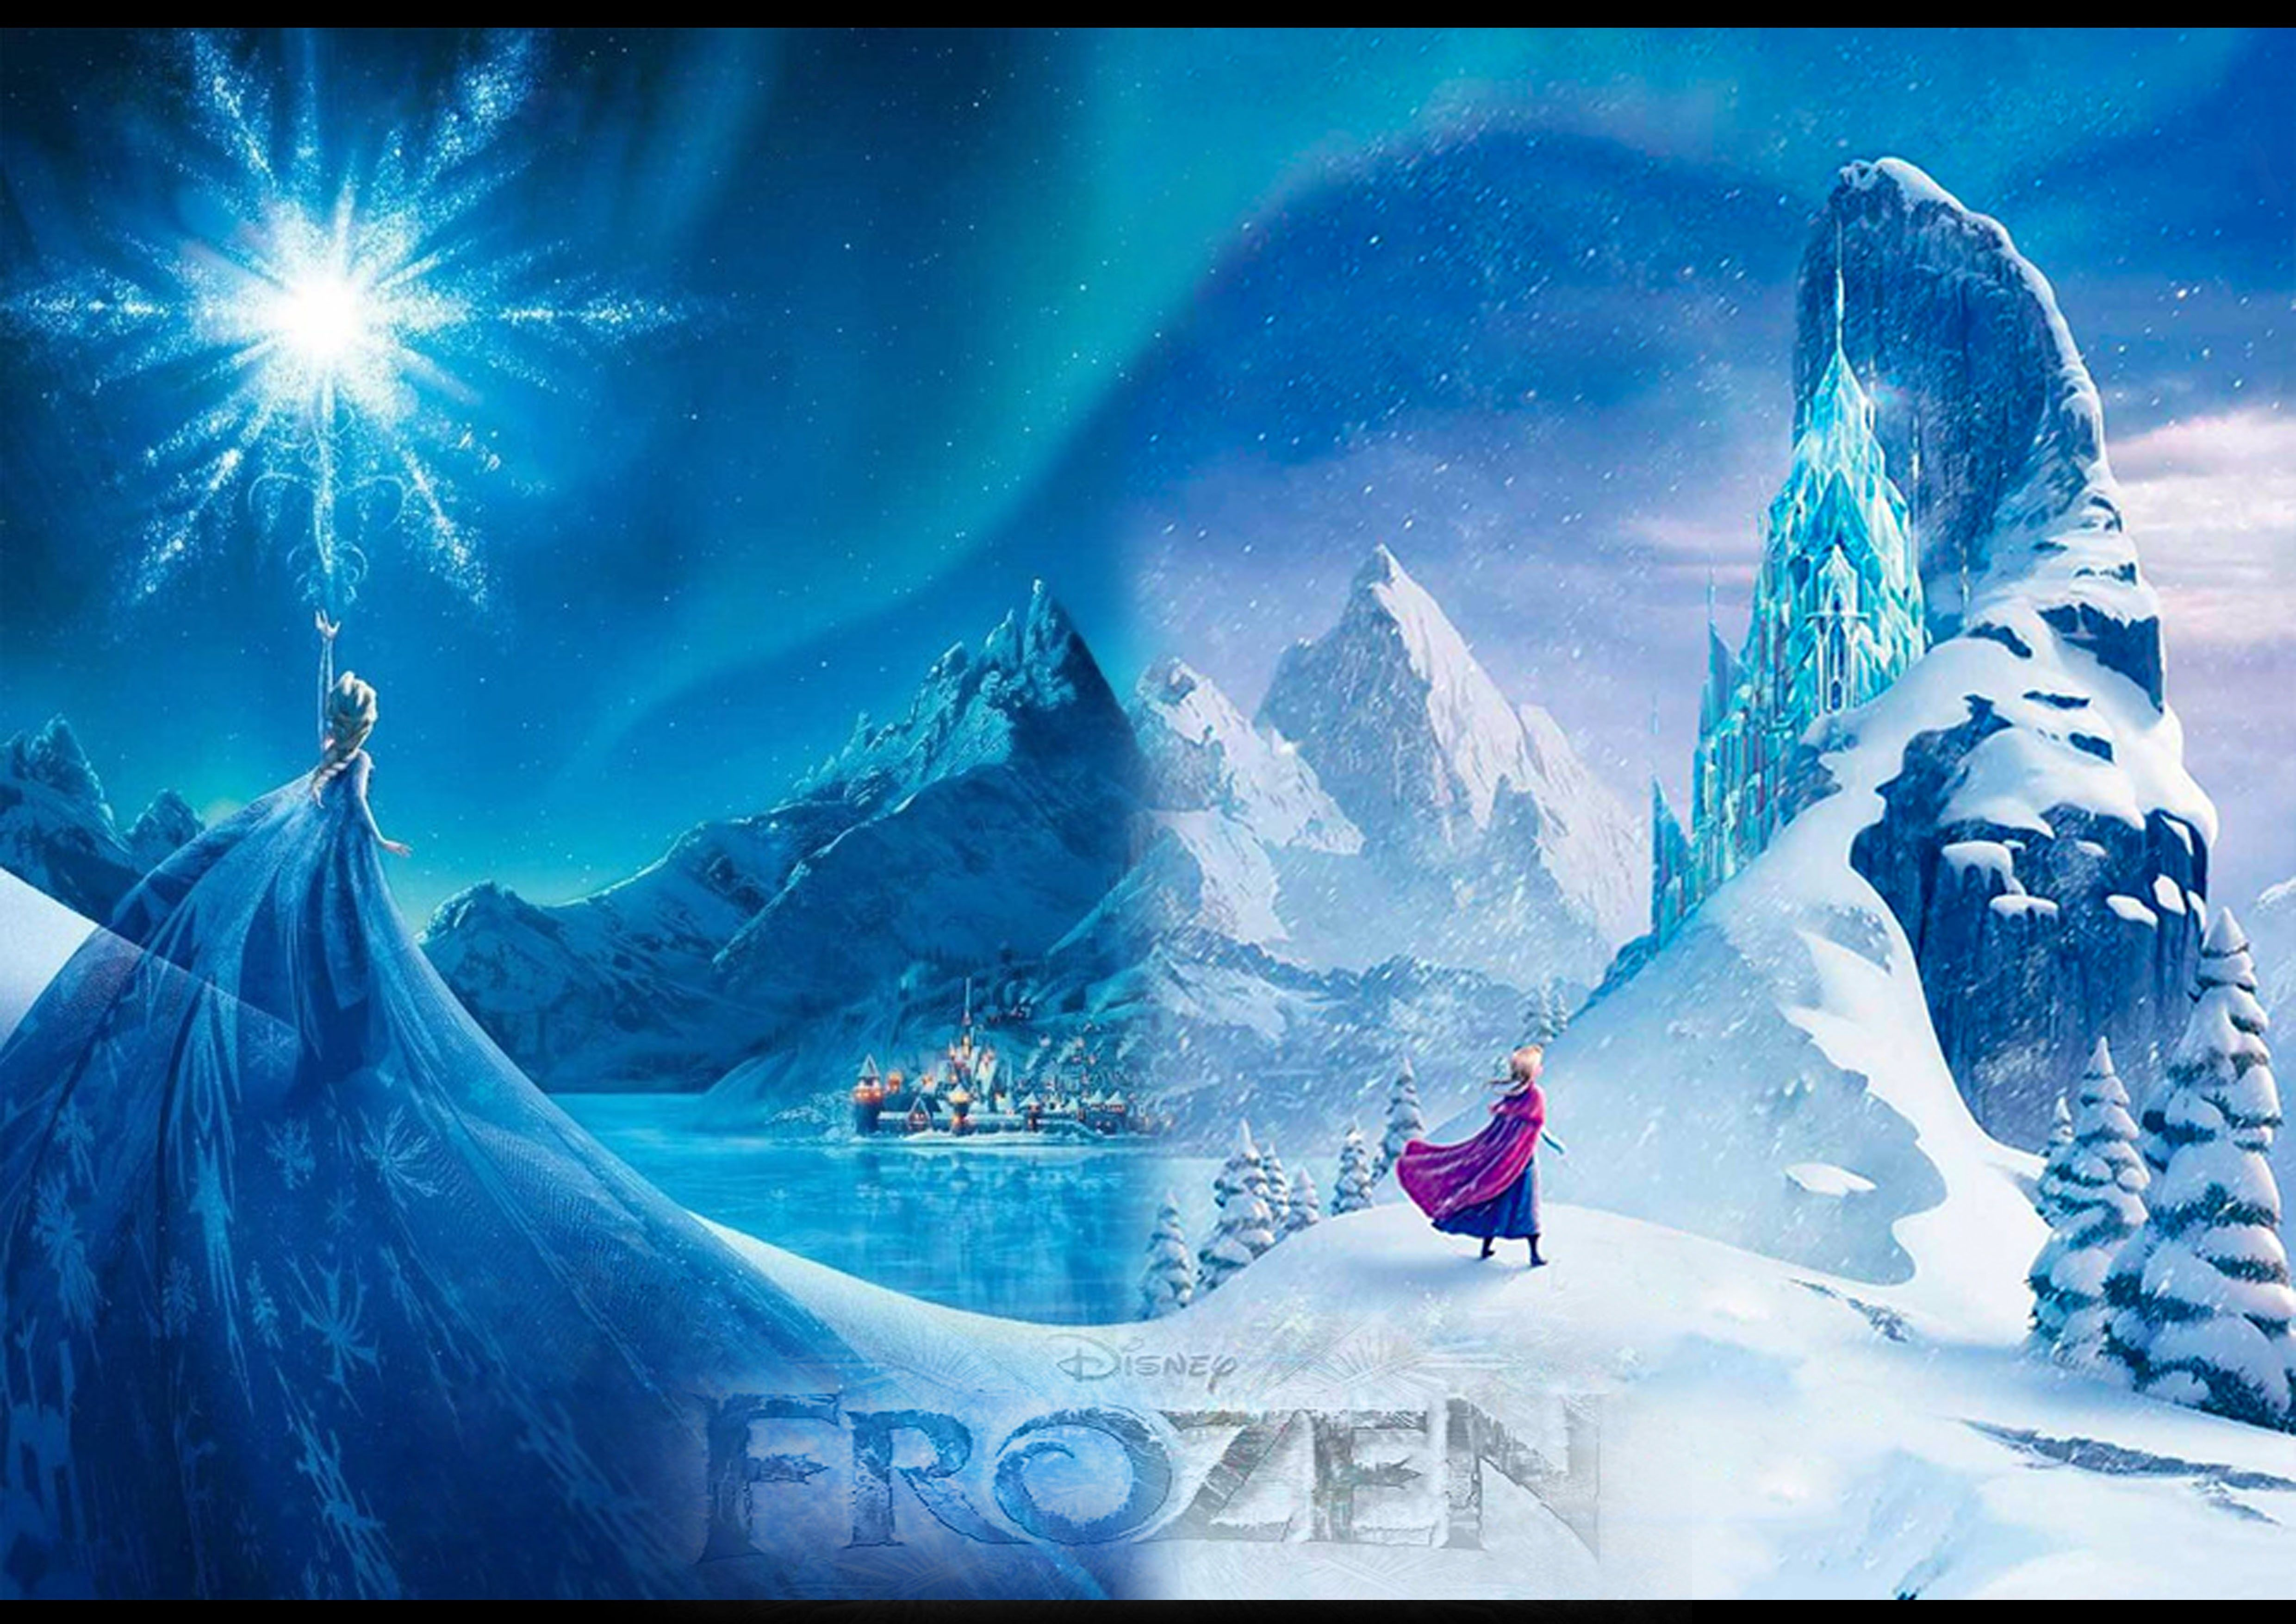 4k frozen (4961x3508) | gogolmogol | pinterest | hd widescreen